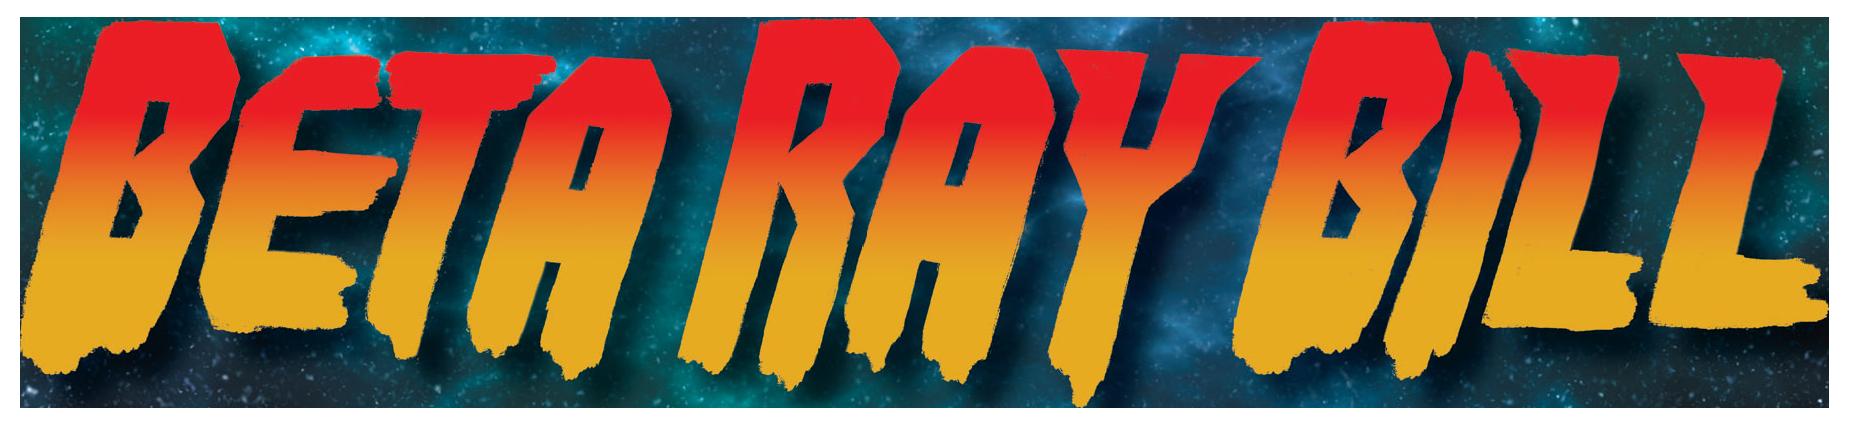 Beta-Ray-Bill-2021.png